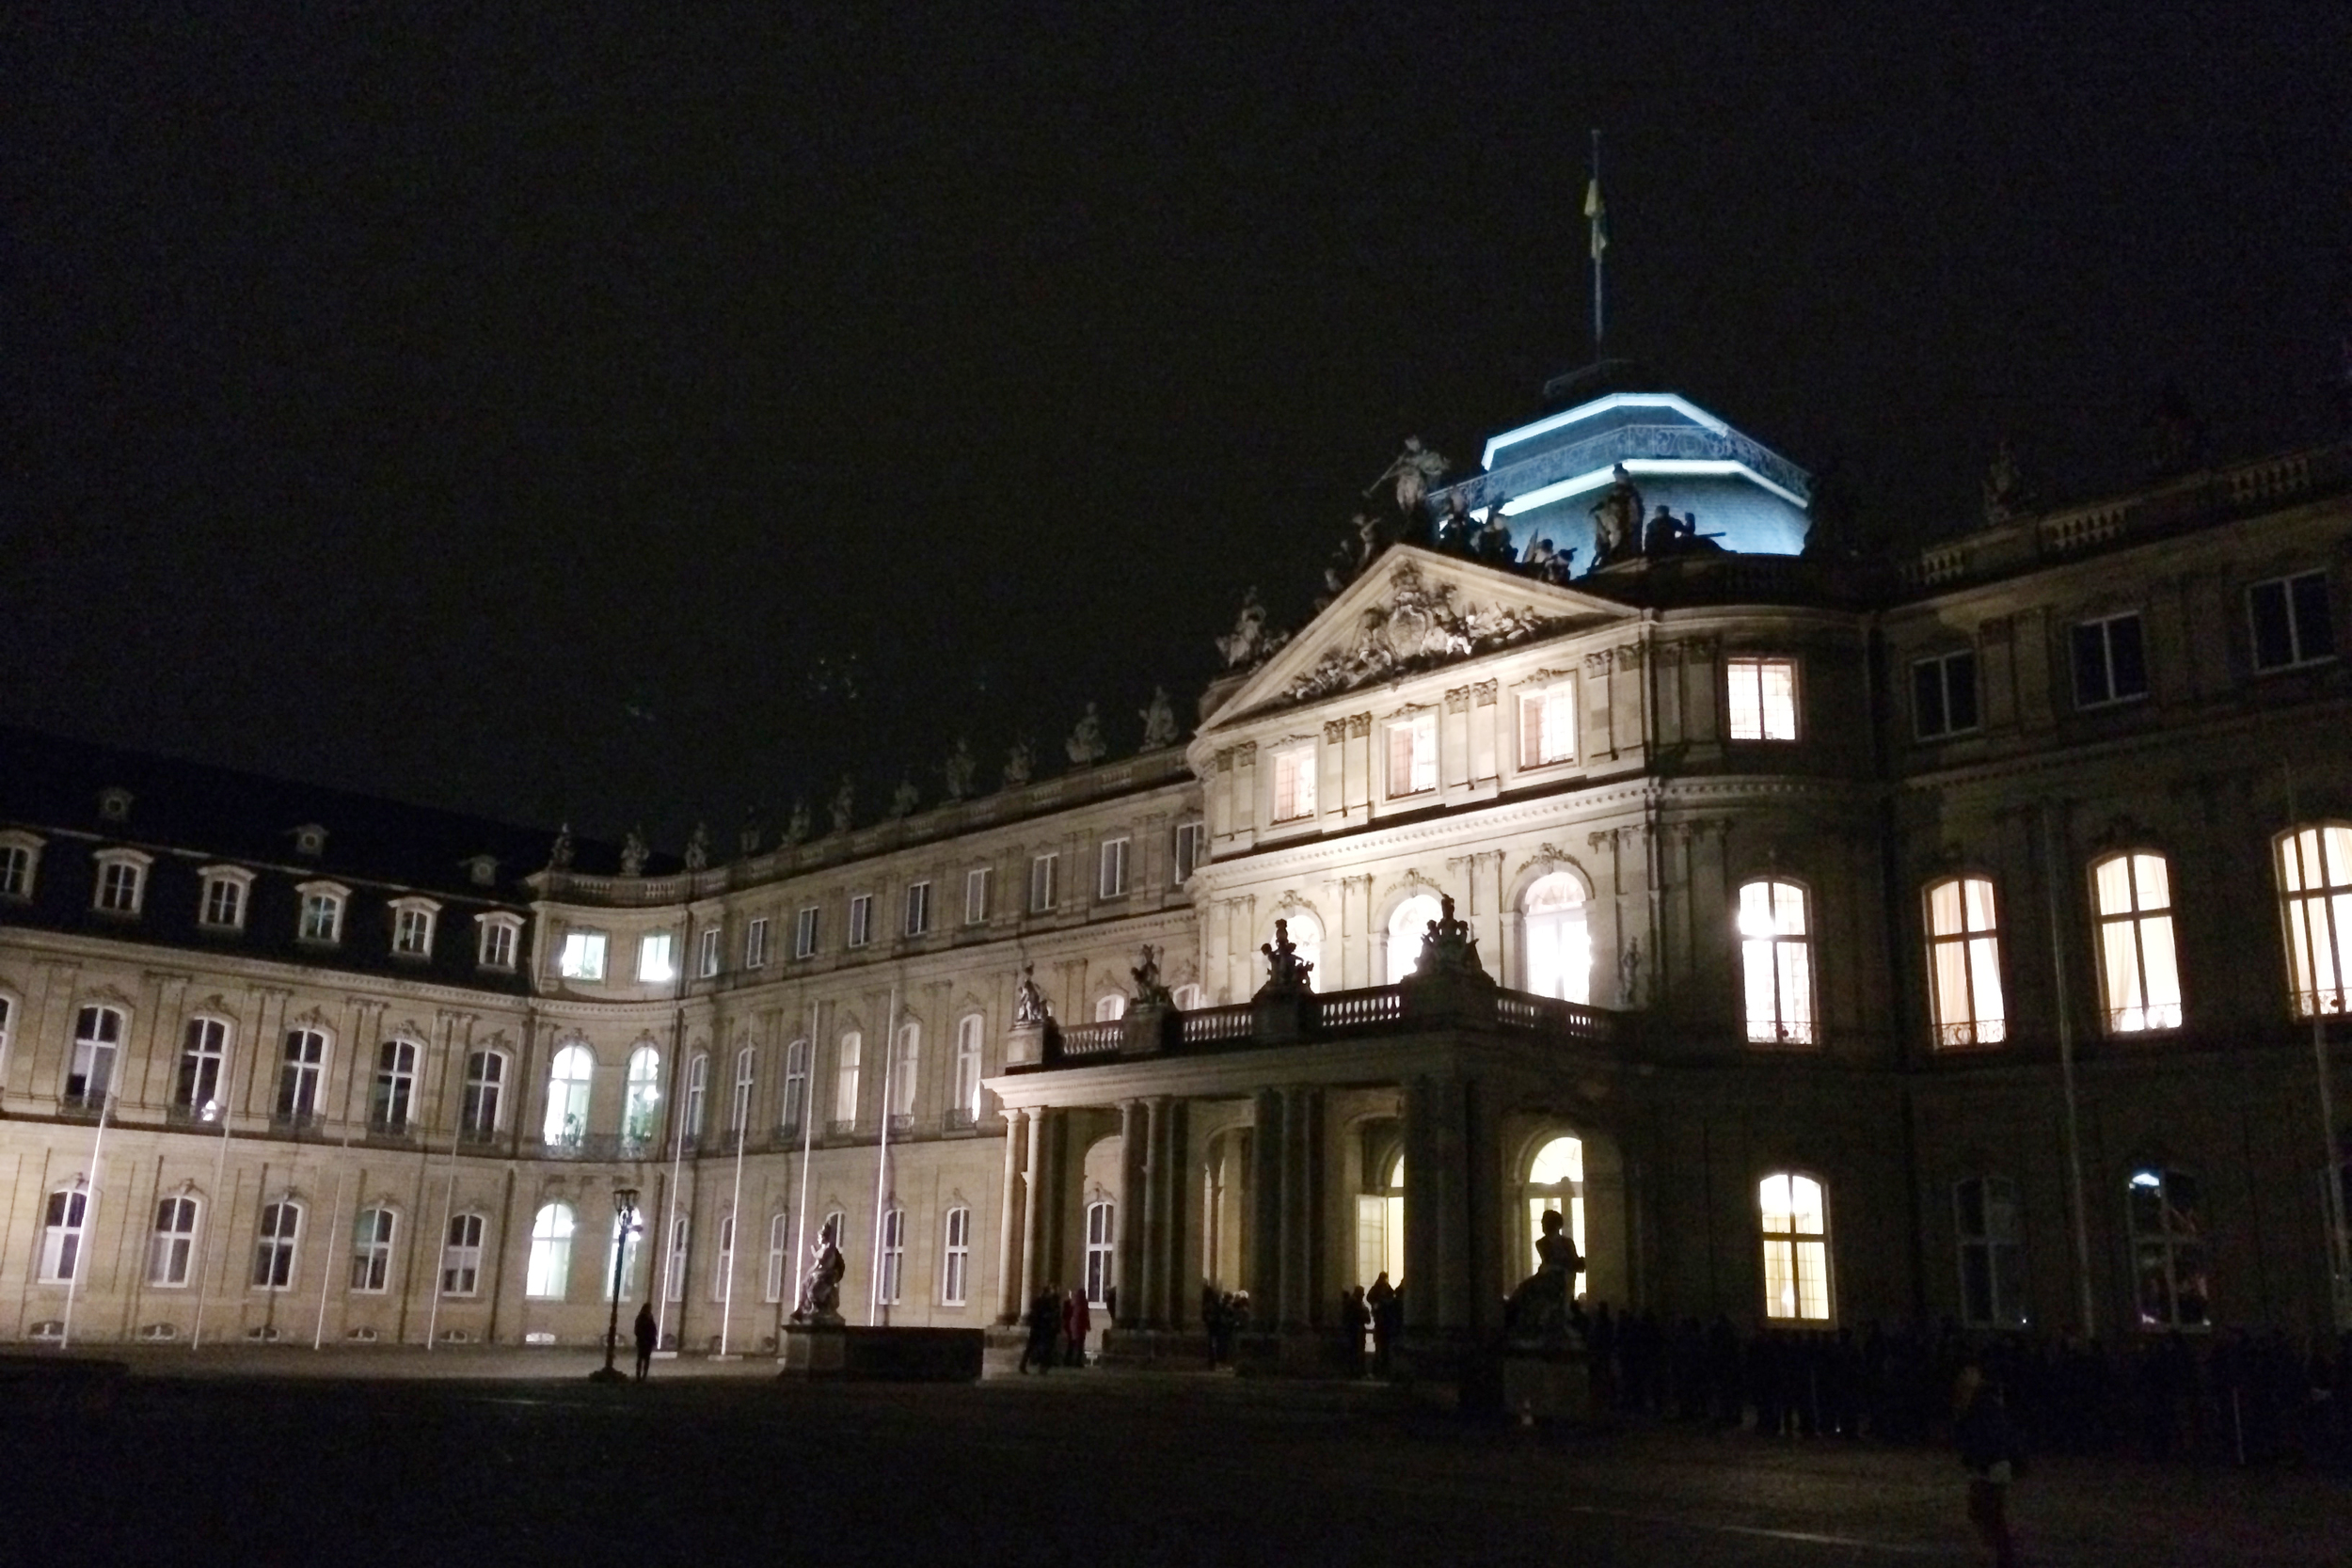 Neues Schloss (the New Castle)